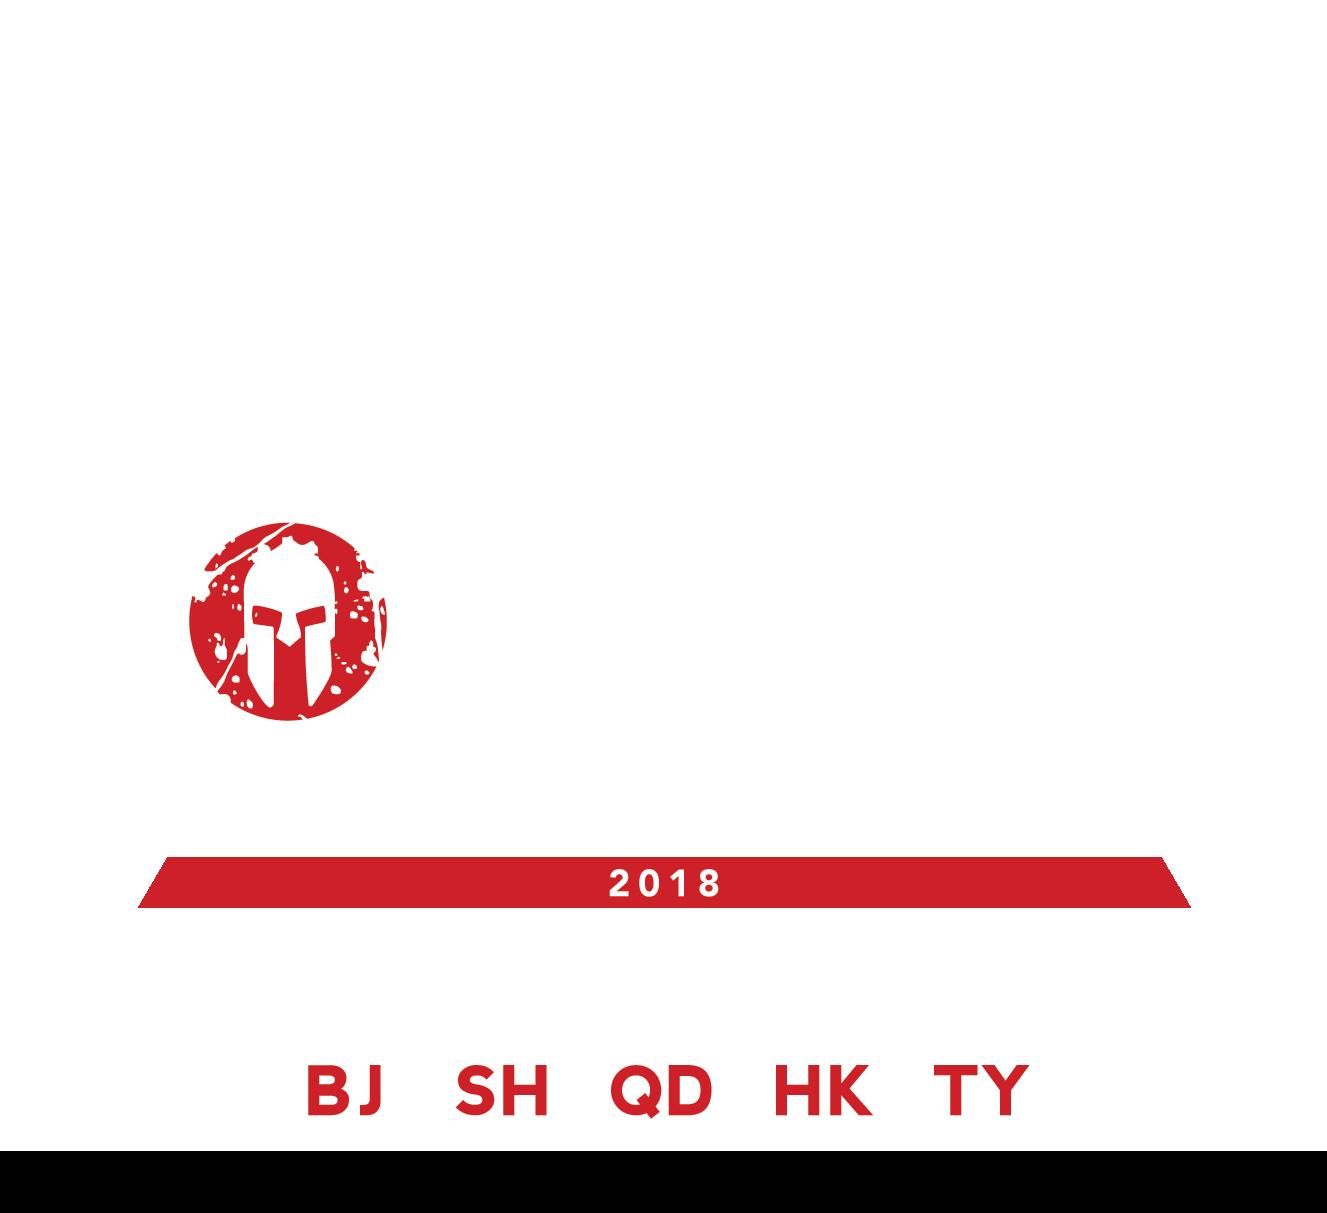 Spartan Hong Kong Obstacle Course Races | Sprint/Kids HongKong 2018